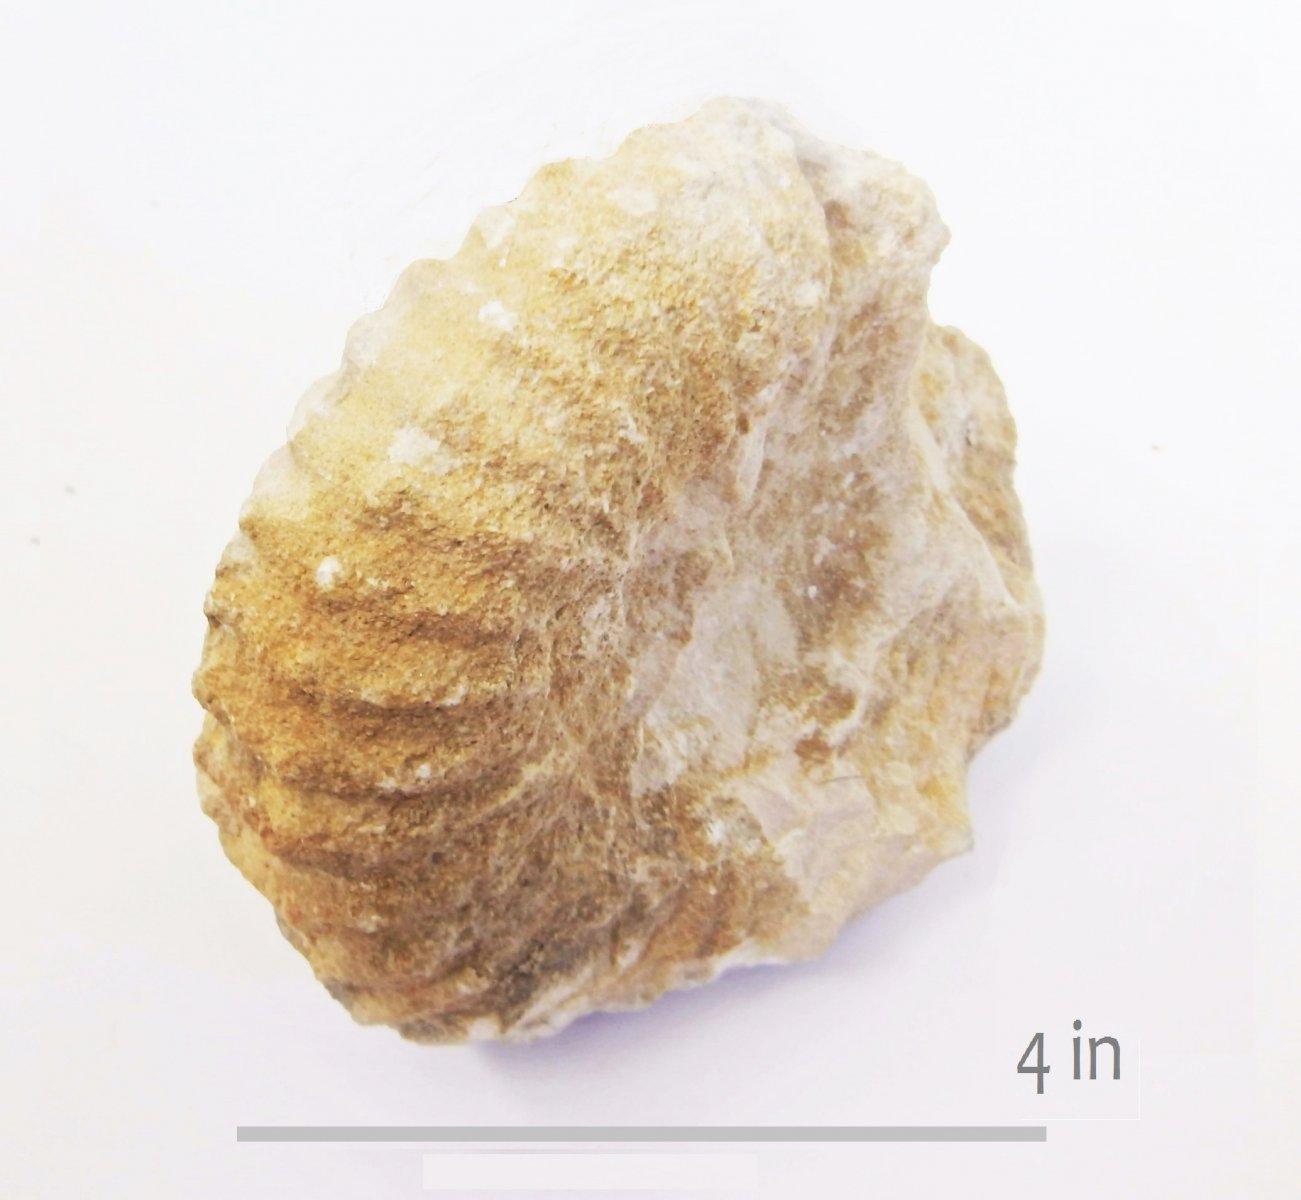 ammonite Sharpeiceras mexicanum buda onion ck